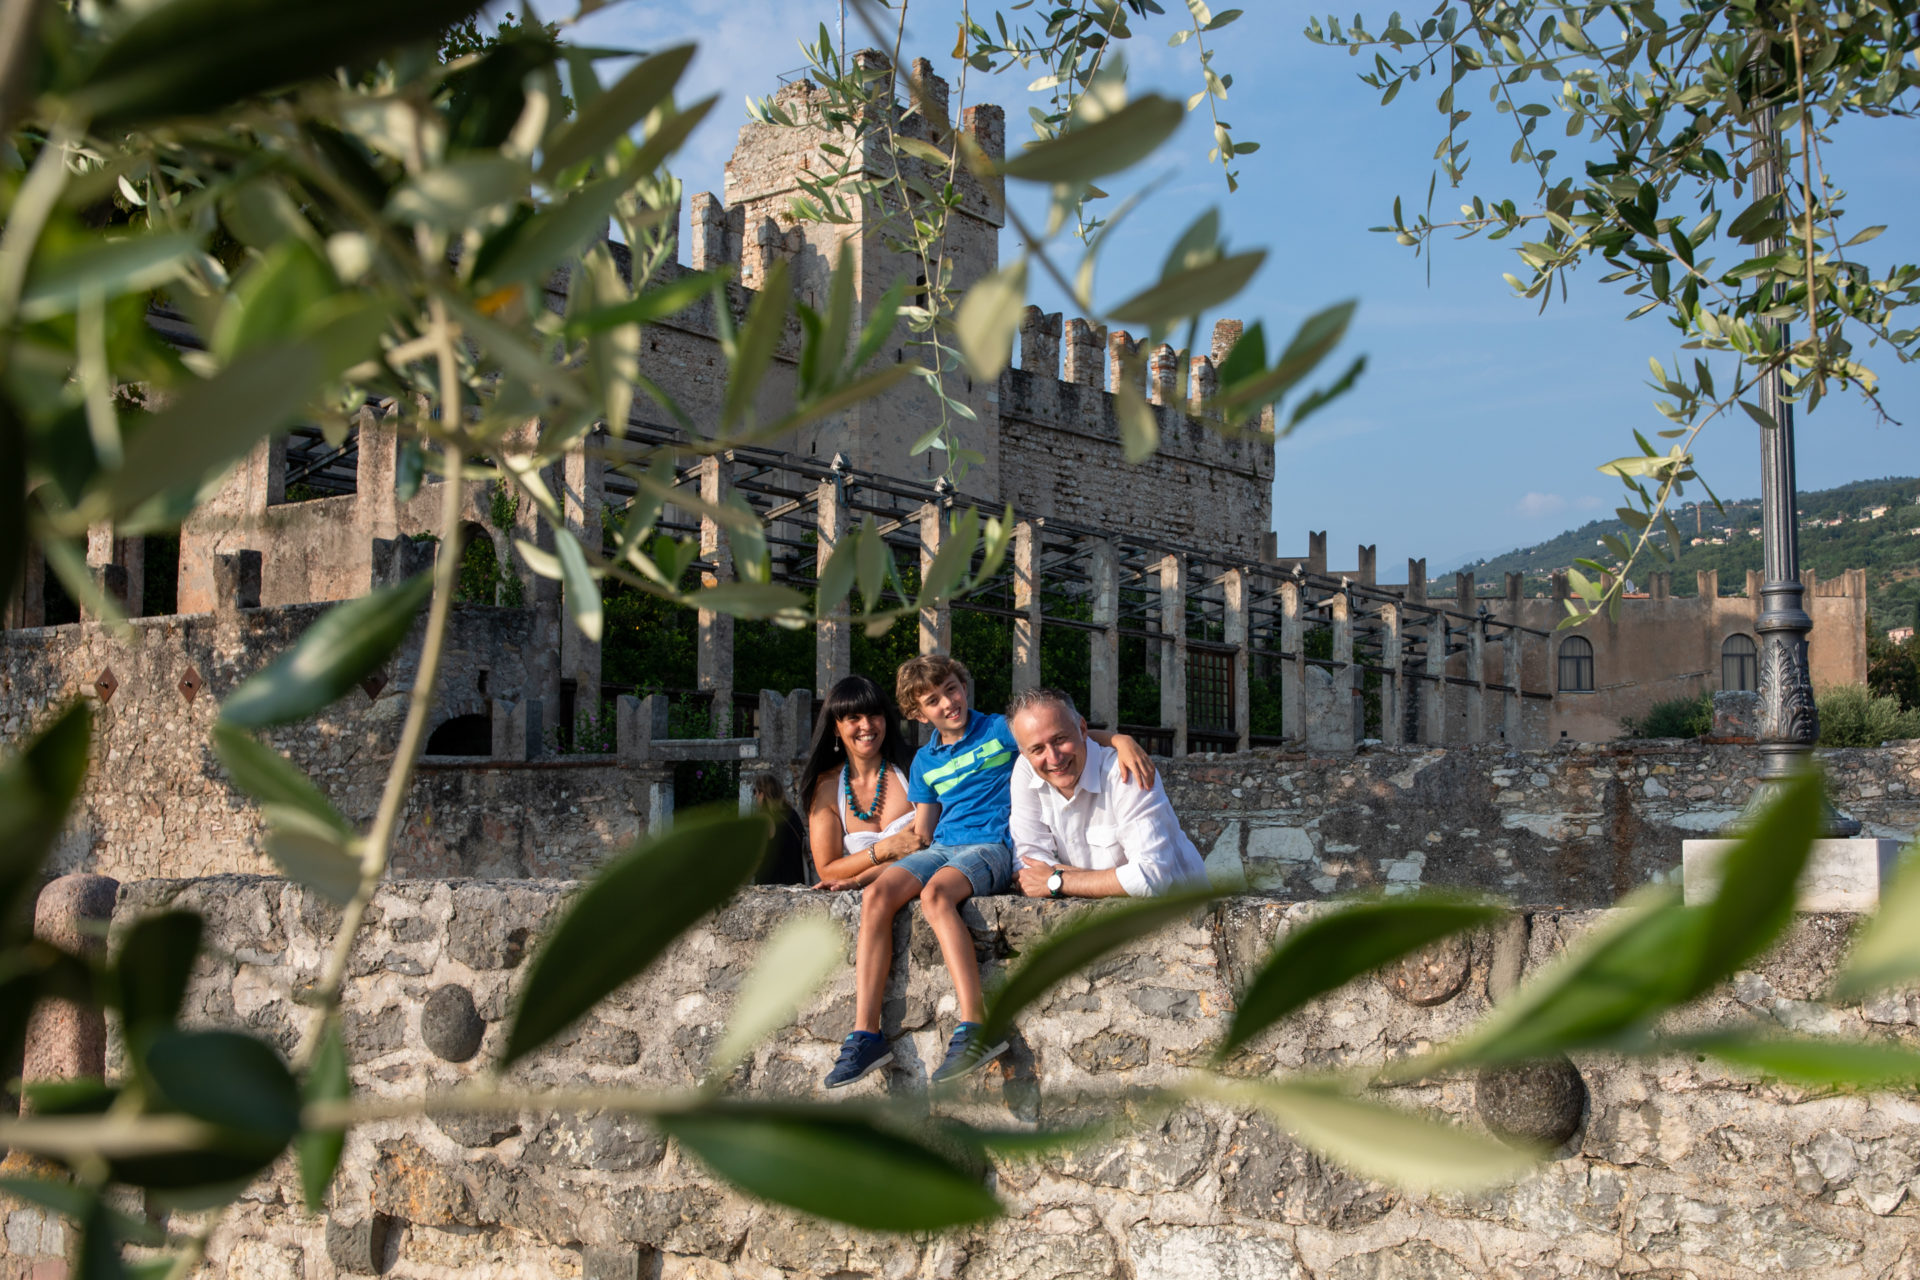 Wedding Photographer Lake Garda Verona GLPSTUDIO FOTO VIDEO Cell. 3355234158